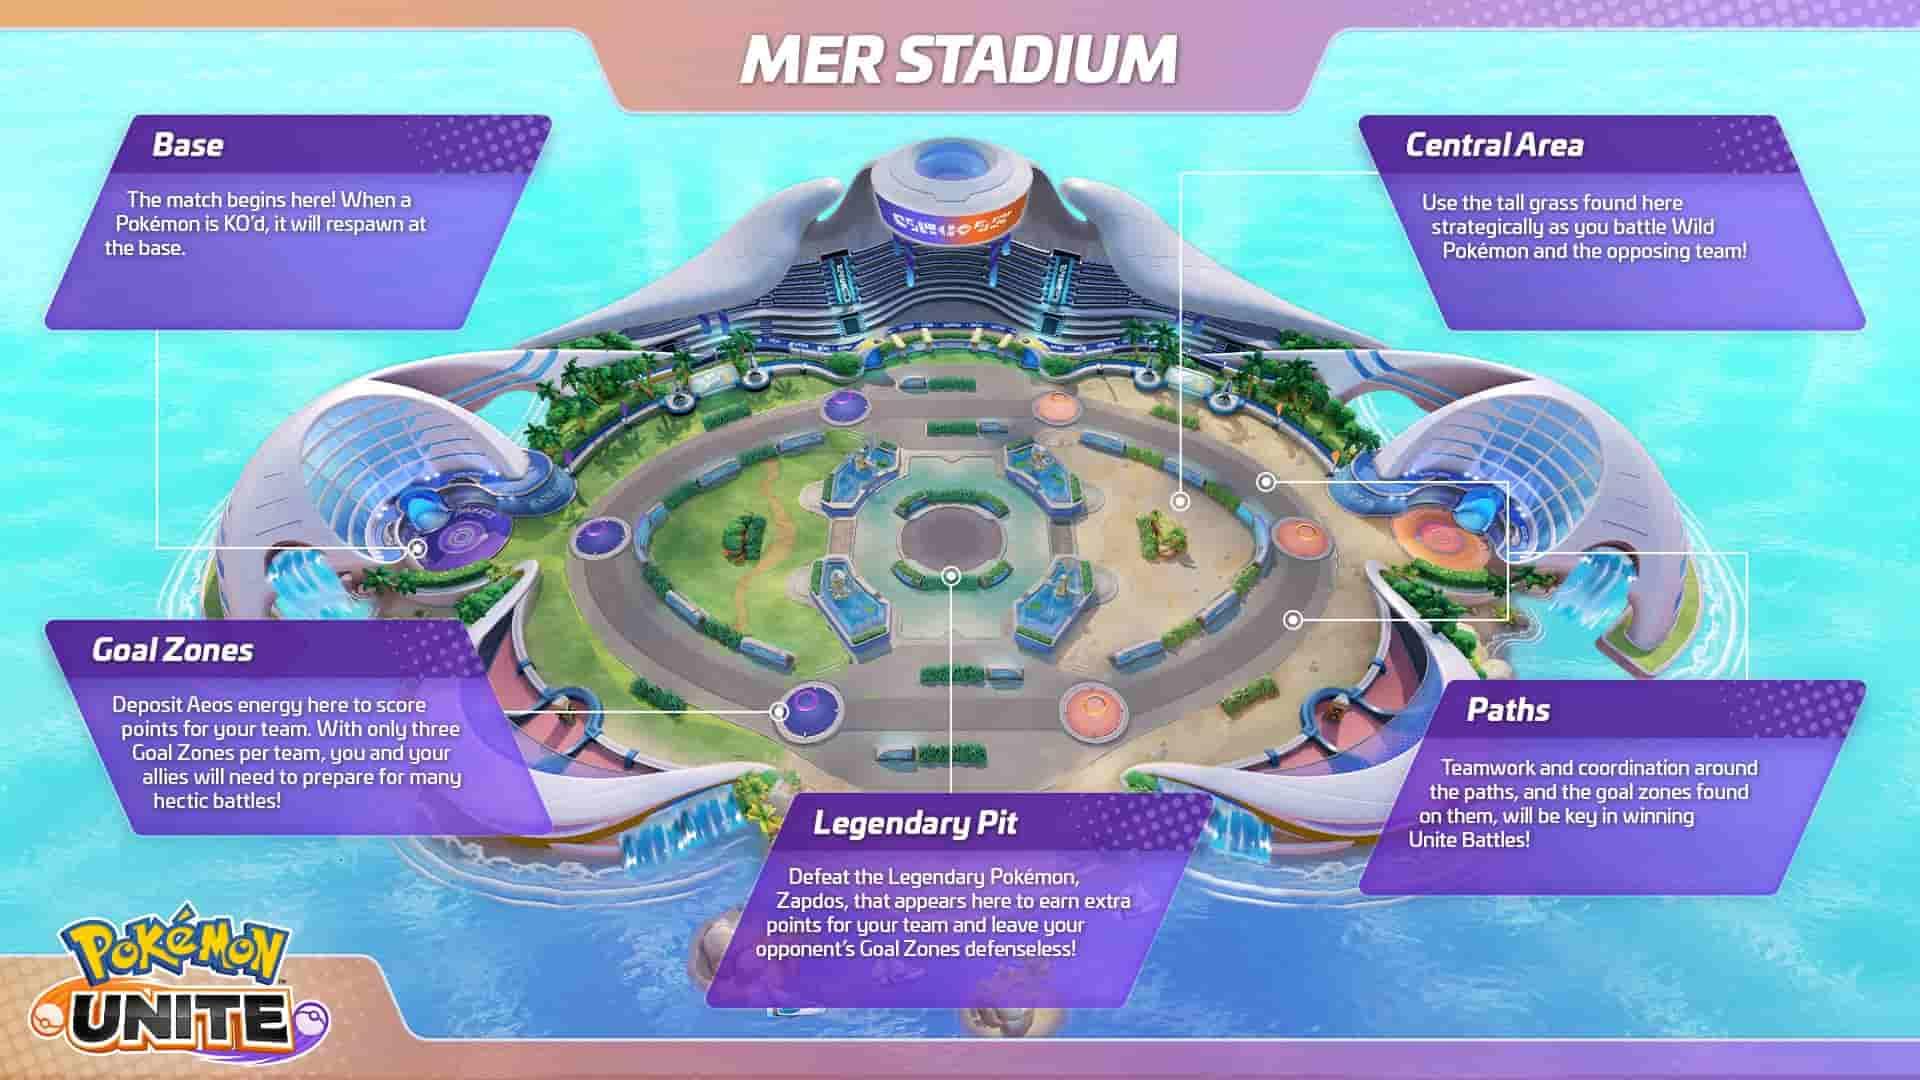 pokemon-unite-mer-stadium-map